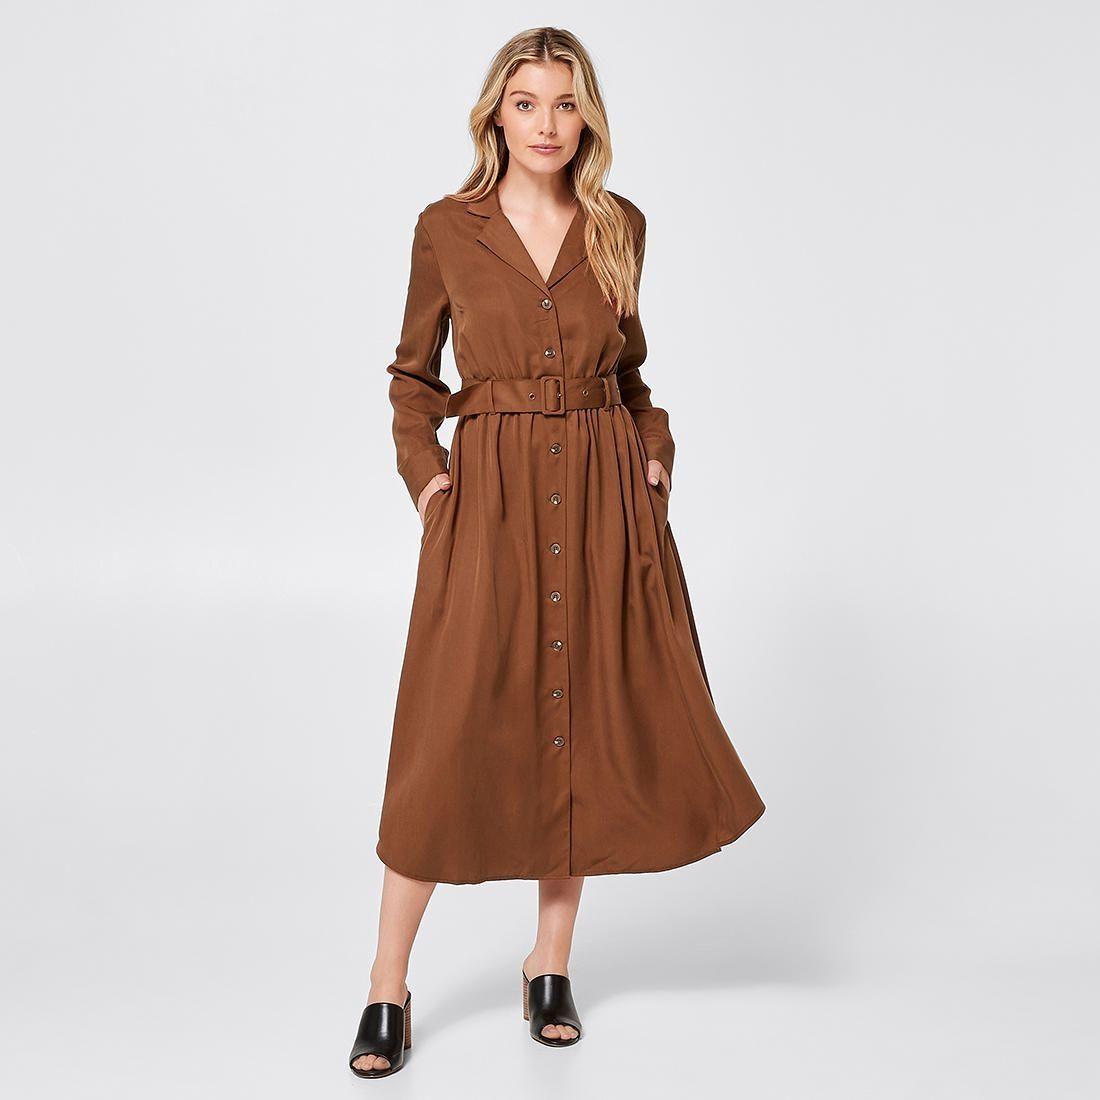 Long Sleeve Midi Shirt Dress Tortoise Shell Brown Target Australia Long Sleeve Midi Shirt Dress Shirt Dress Midi Shirt Dress [ 1100 x 1100 Pixel ]